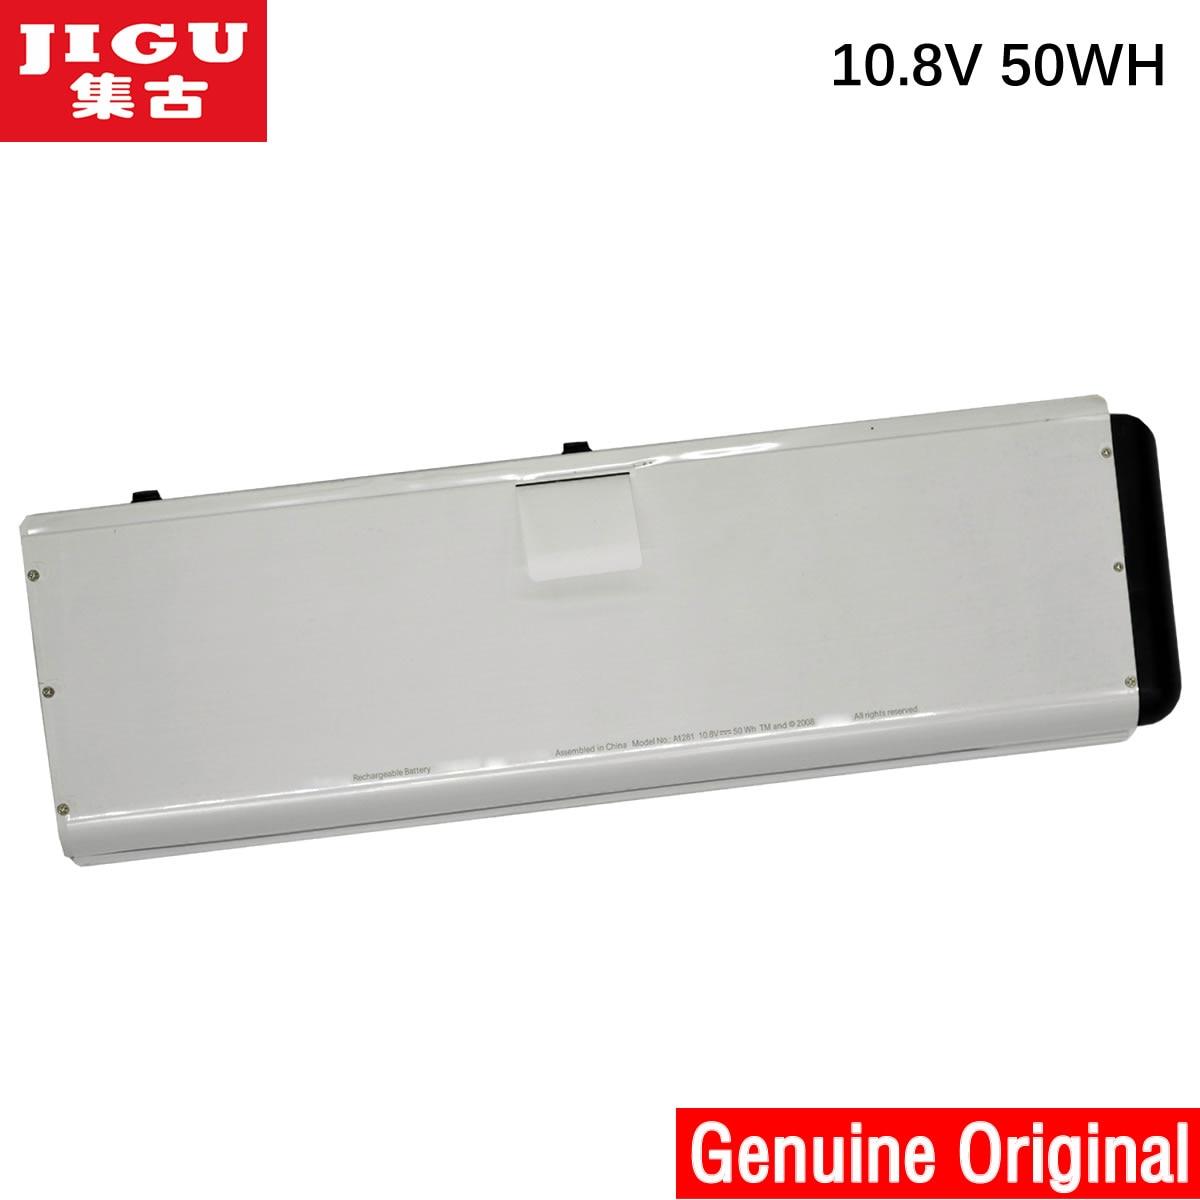 JIGU Original Laptop battery A1281 for Apple MacBook Pro 15 A1286 Aluminum Unibody Series(2008 Version) MB470*/A  10.8V 50WH